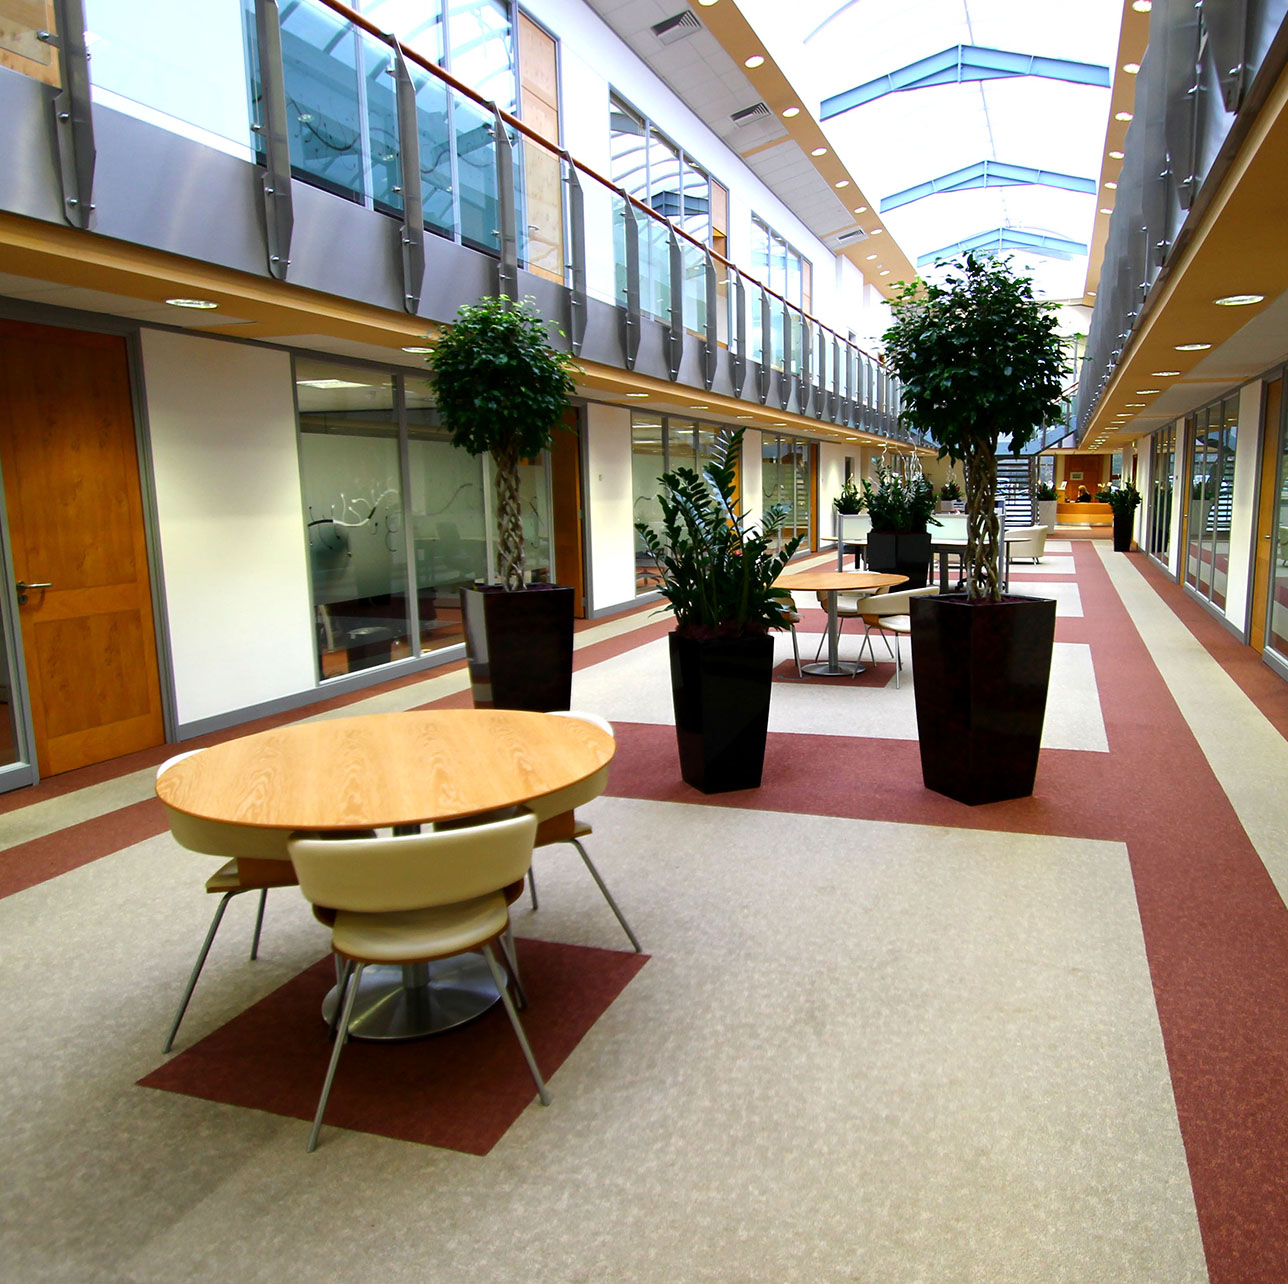 Carrwood park atrium